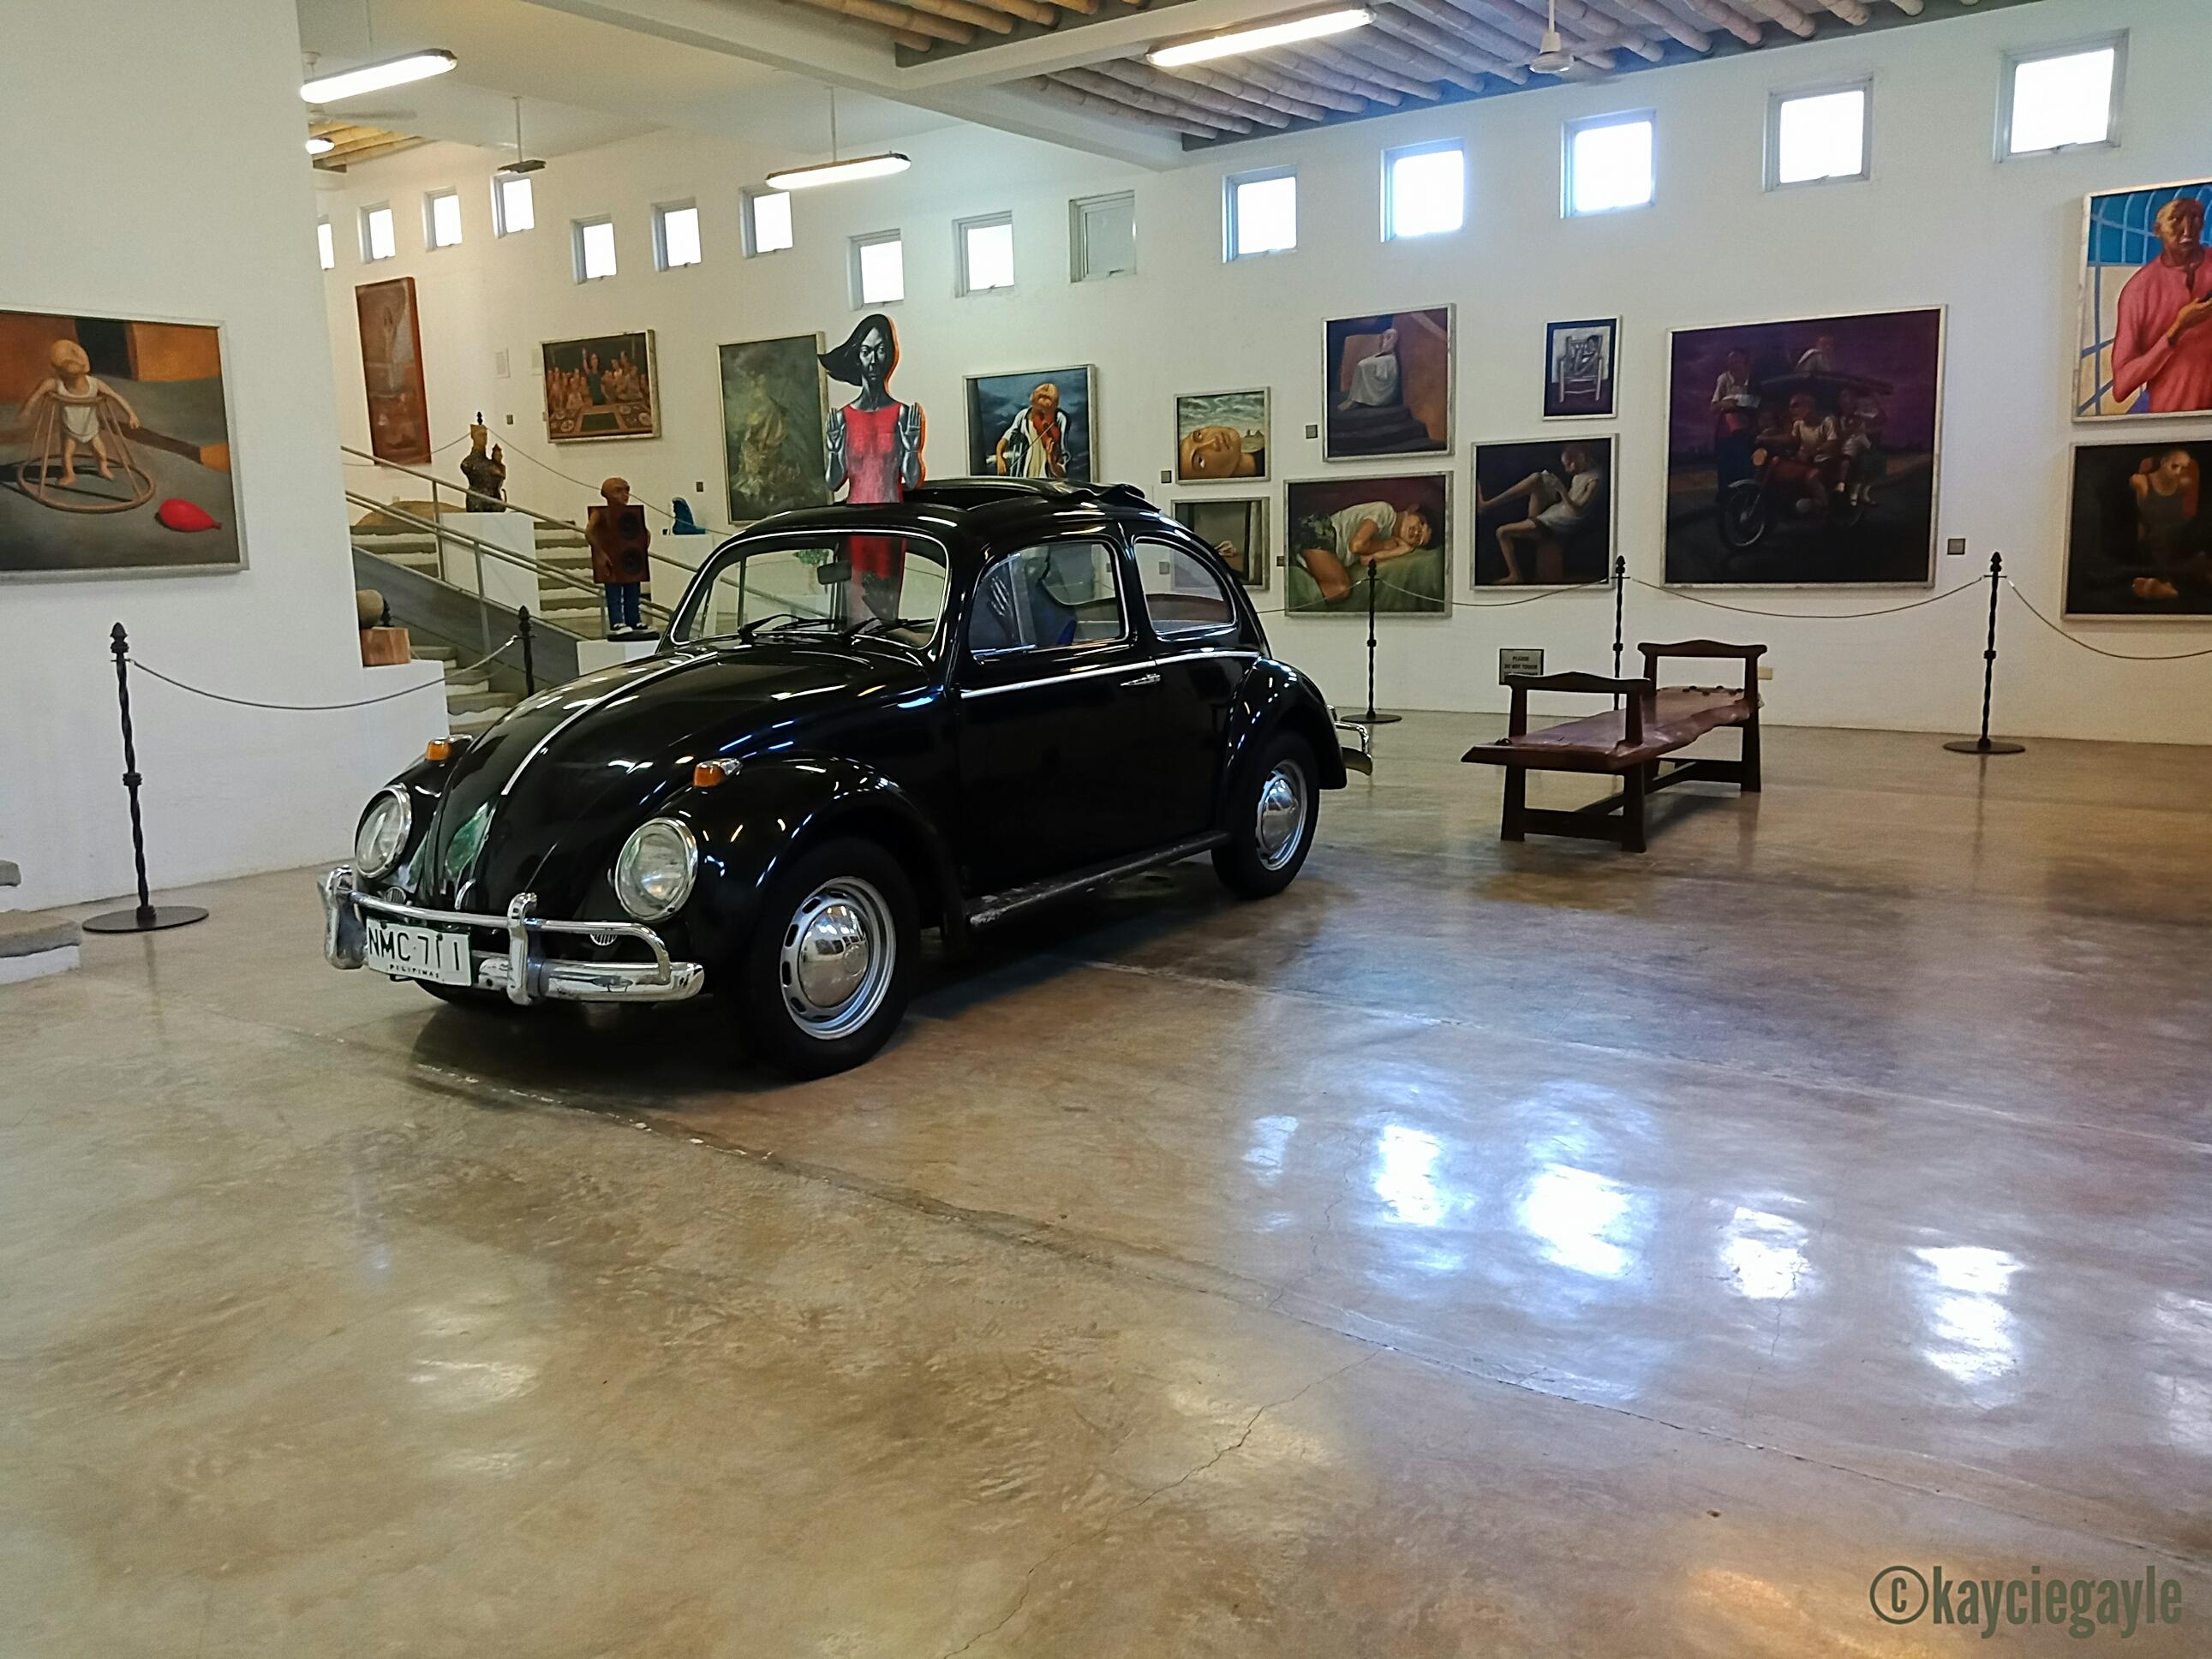 87 pinto art museum - misswoman.co